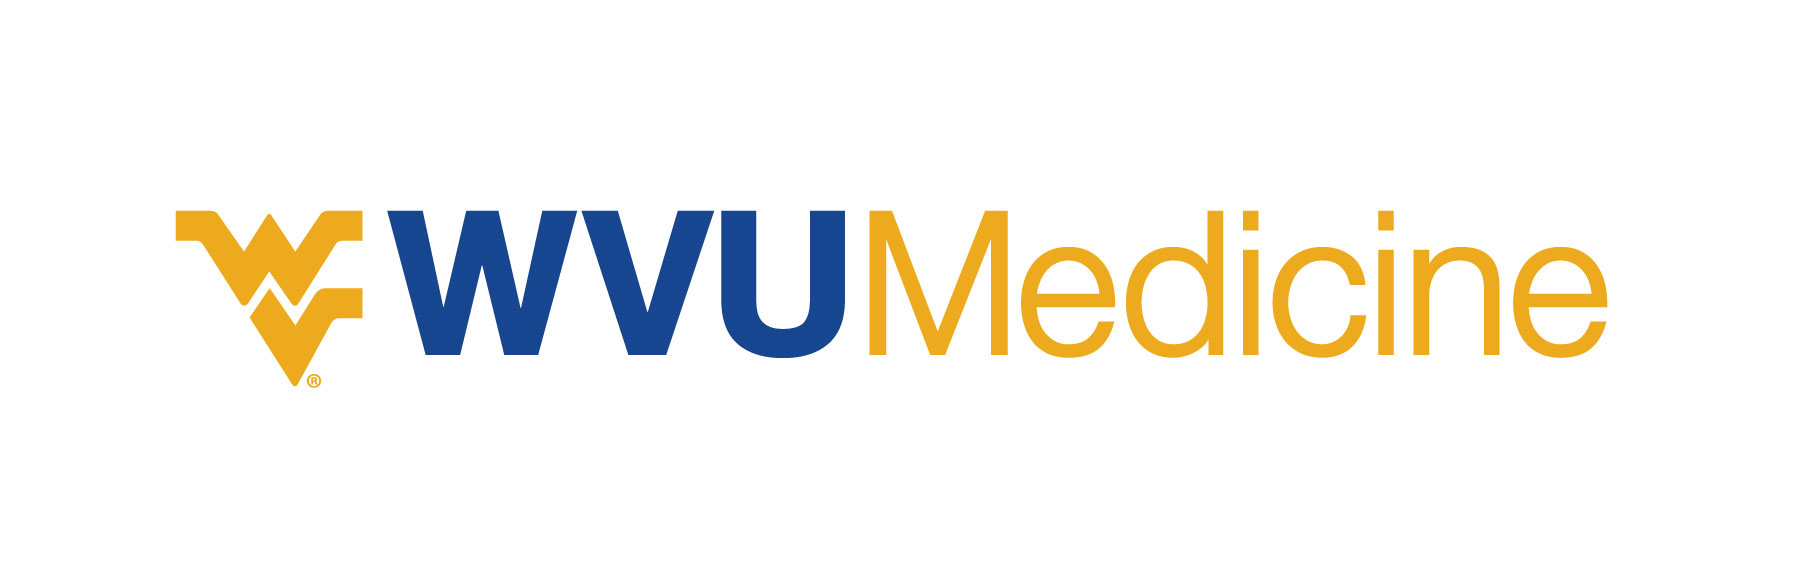 Patient Care | Health Sciences Center | West Virginia University